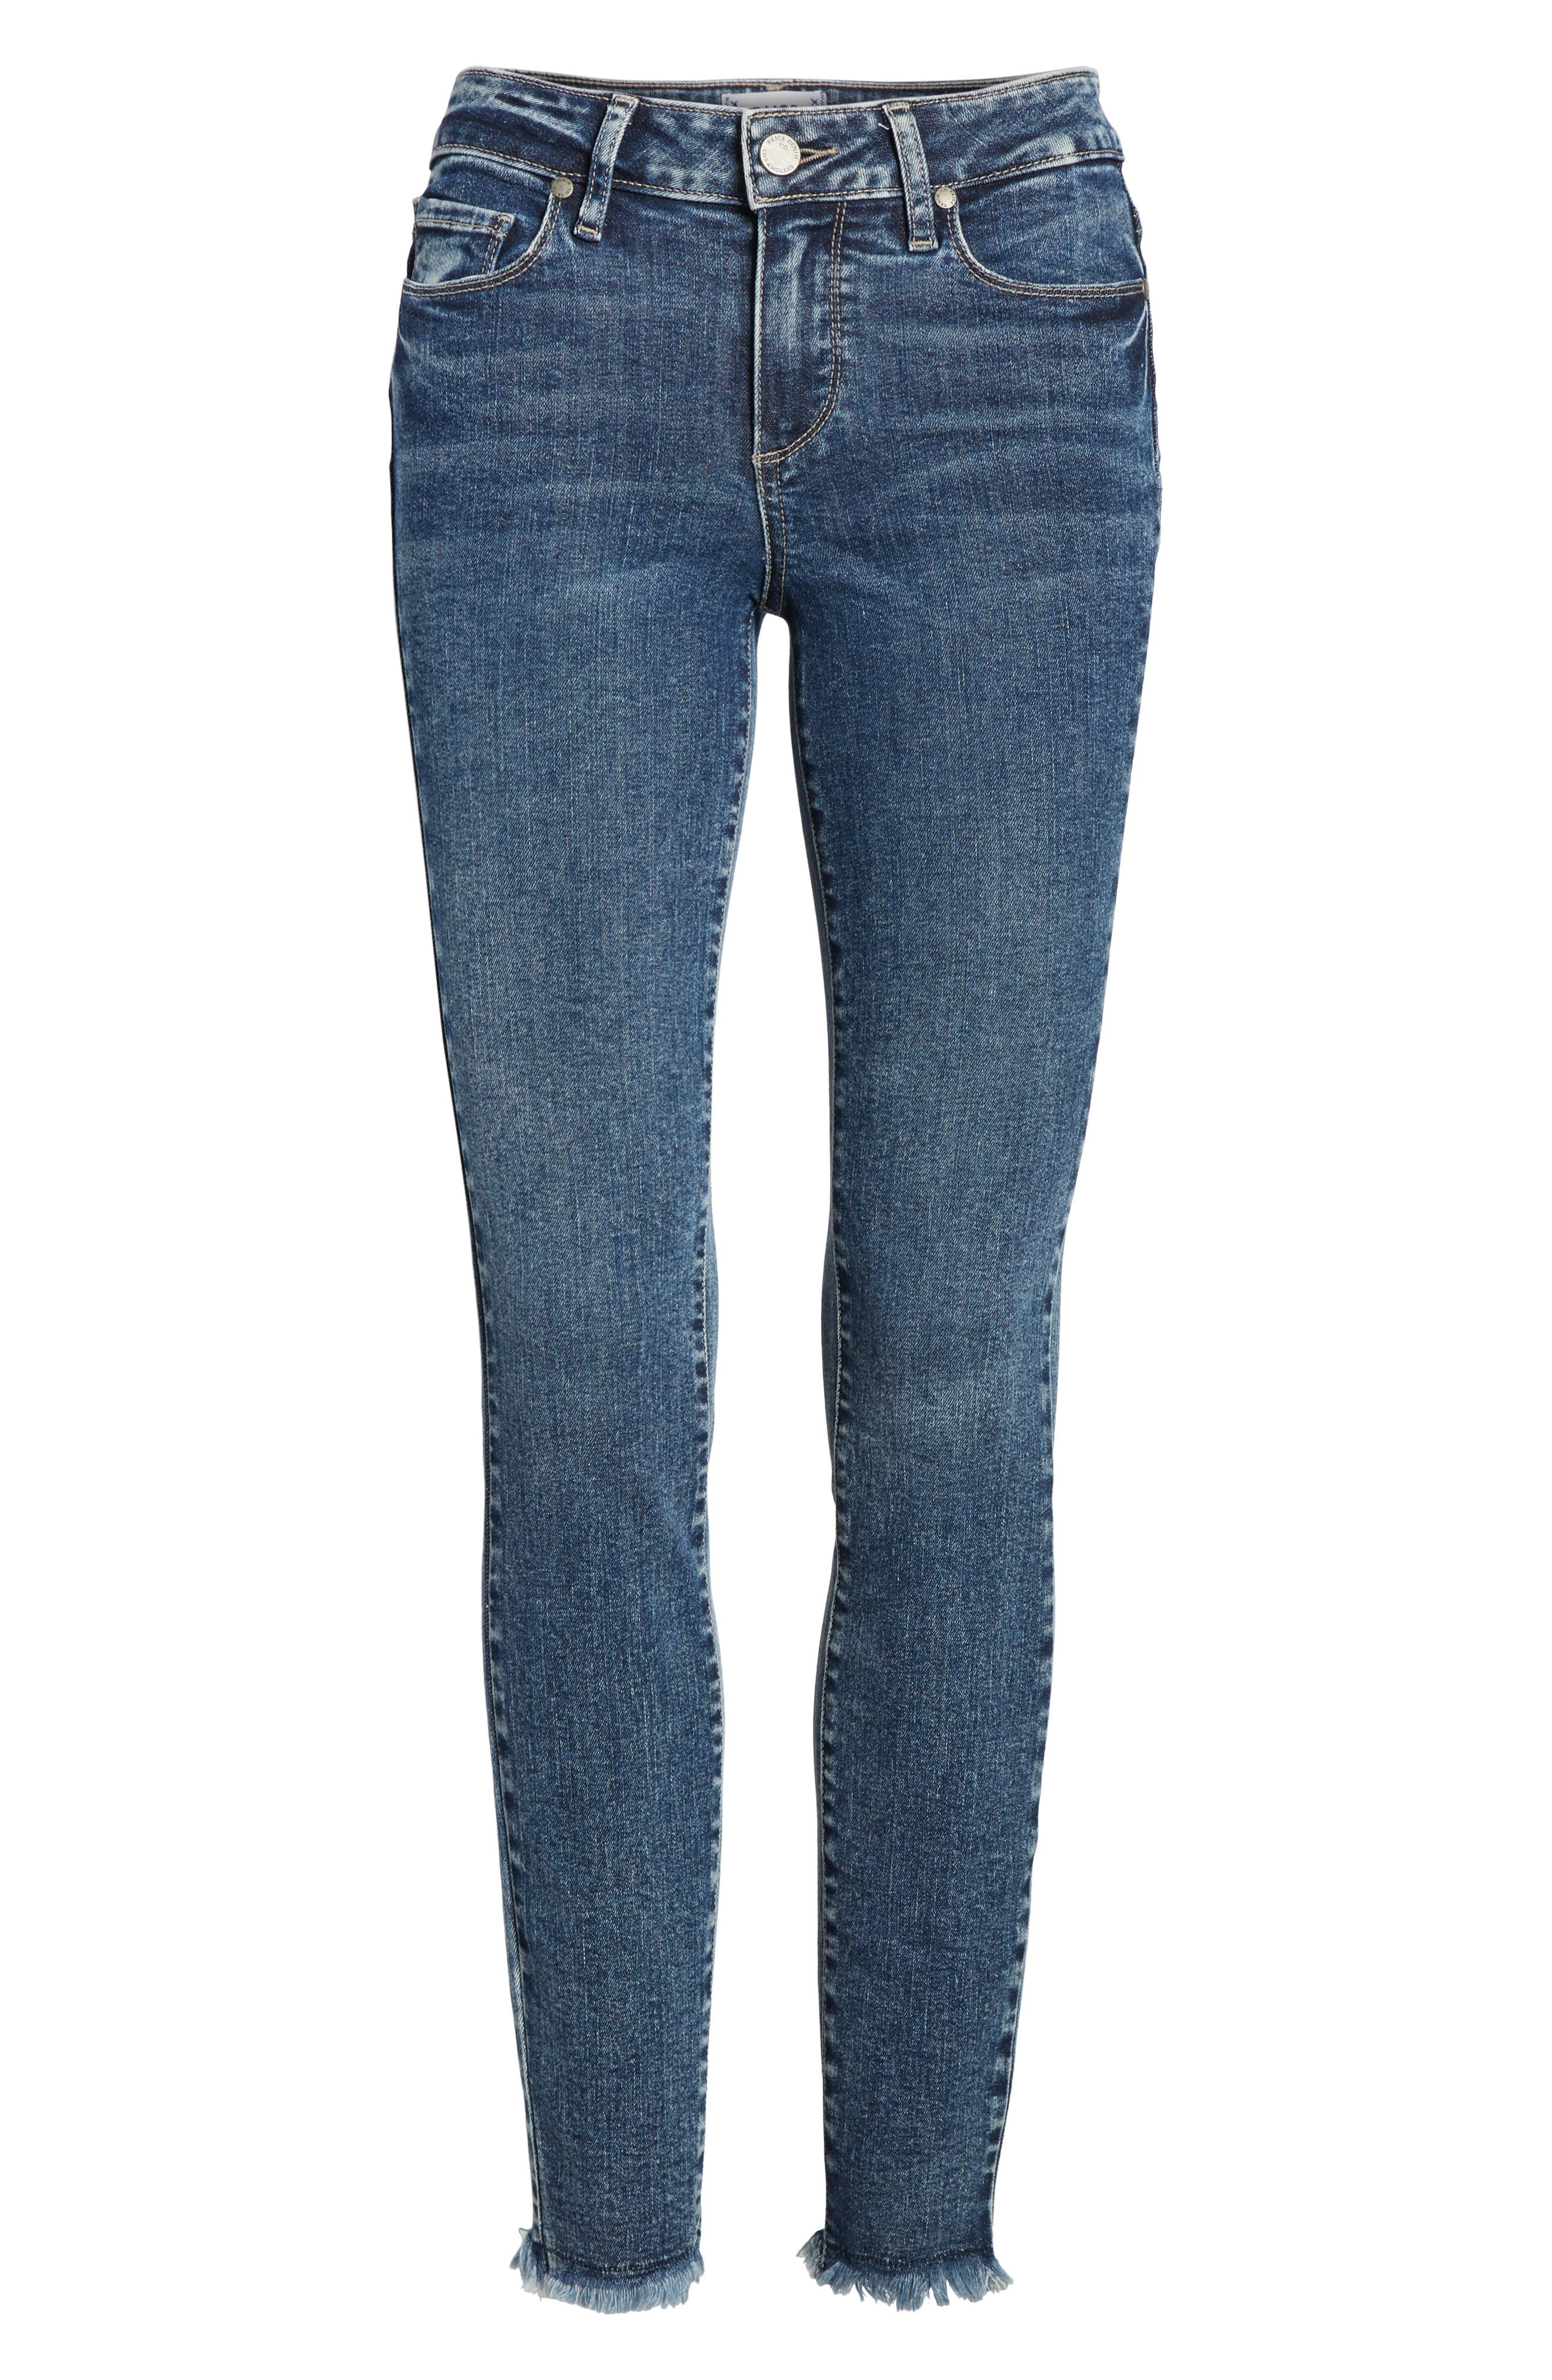 Transcend Vintage - Verdugo Ultra Skinny Jeans,                             Alternate thumbnail 7, color,                             Iness